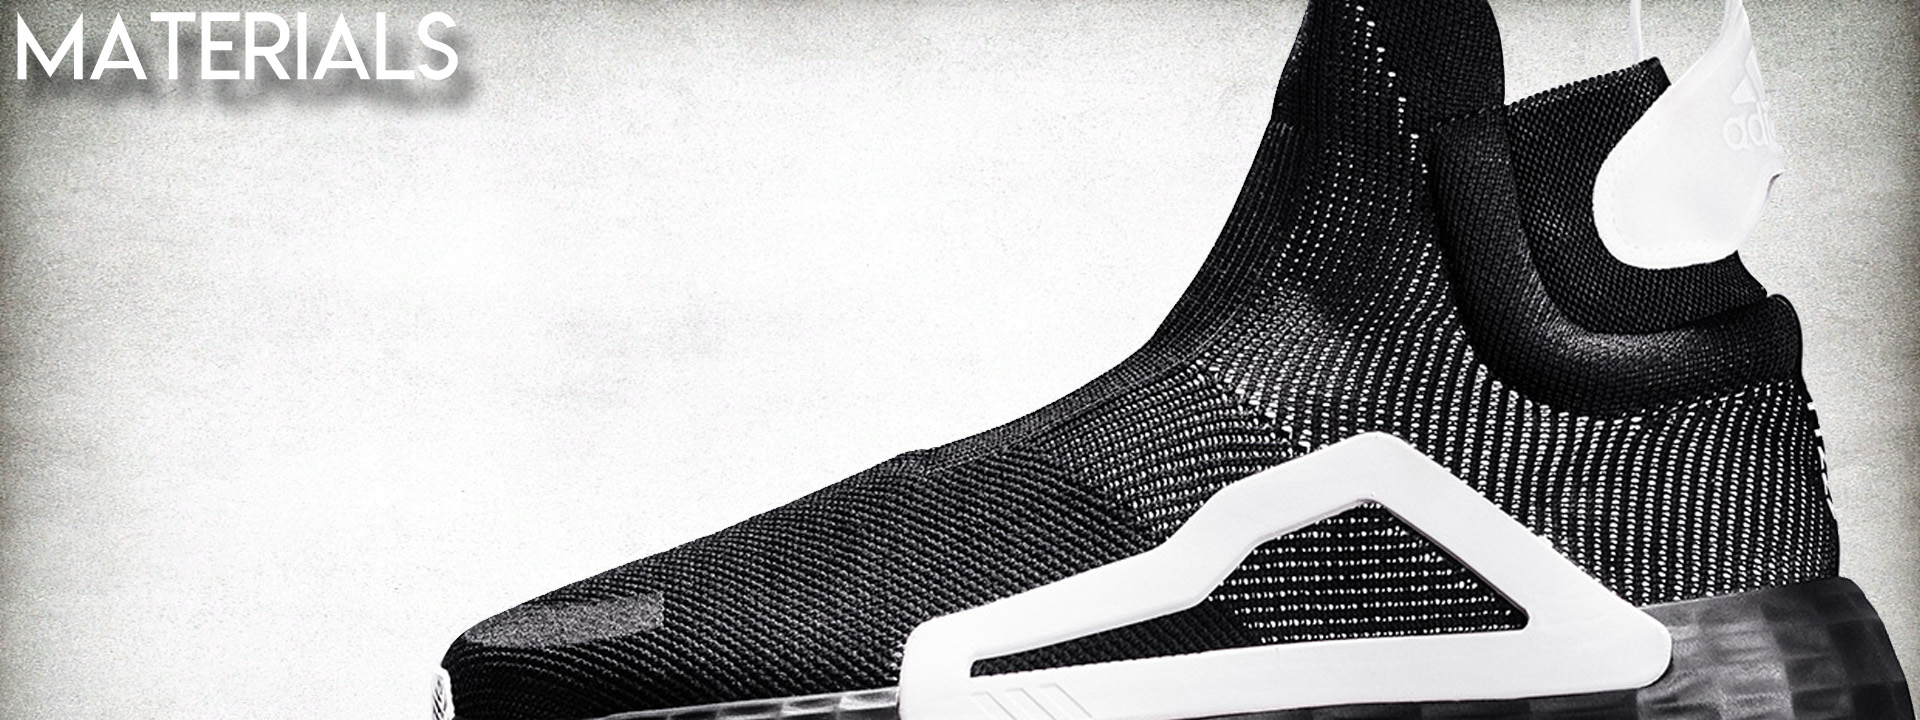 Es barato preocuparse Bibliografía  adidas N3XT L3V3L Performance Review | Duke4005 - WearTesters